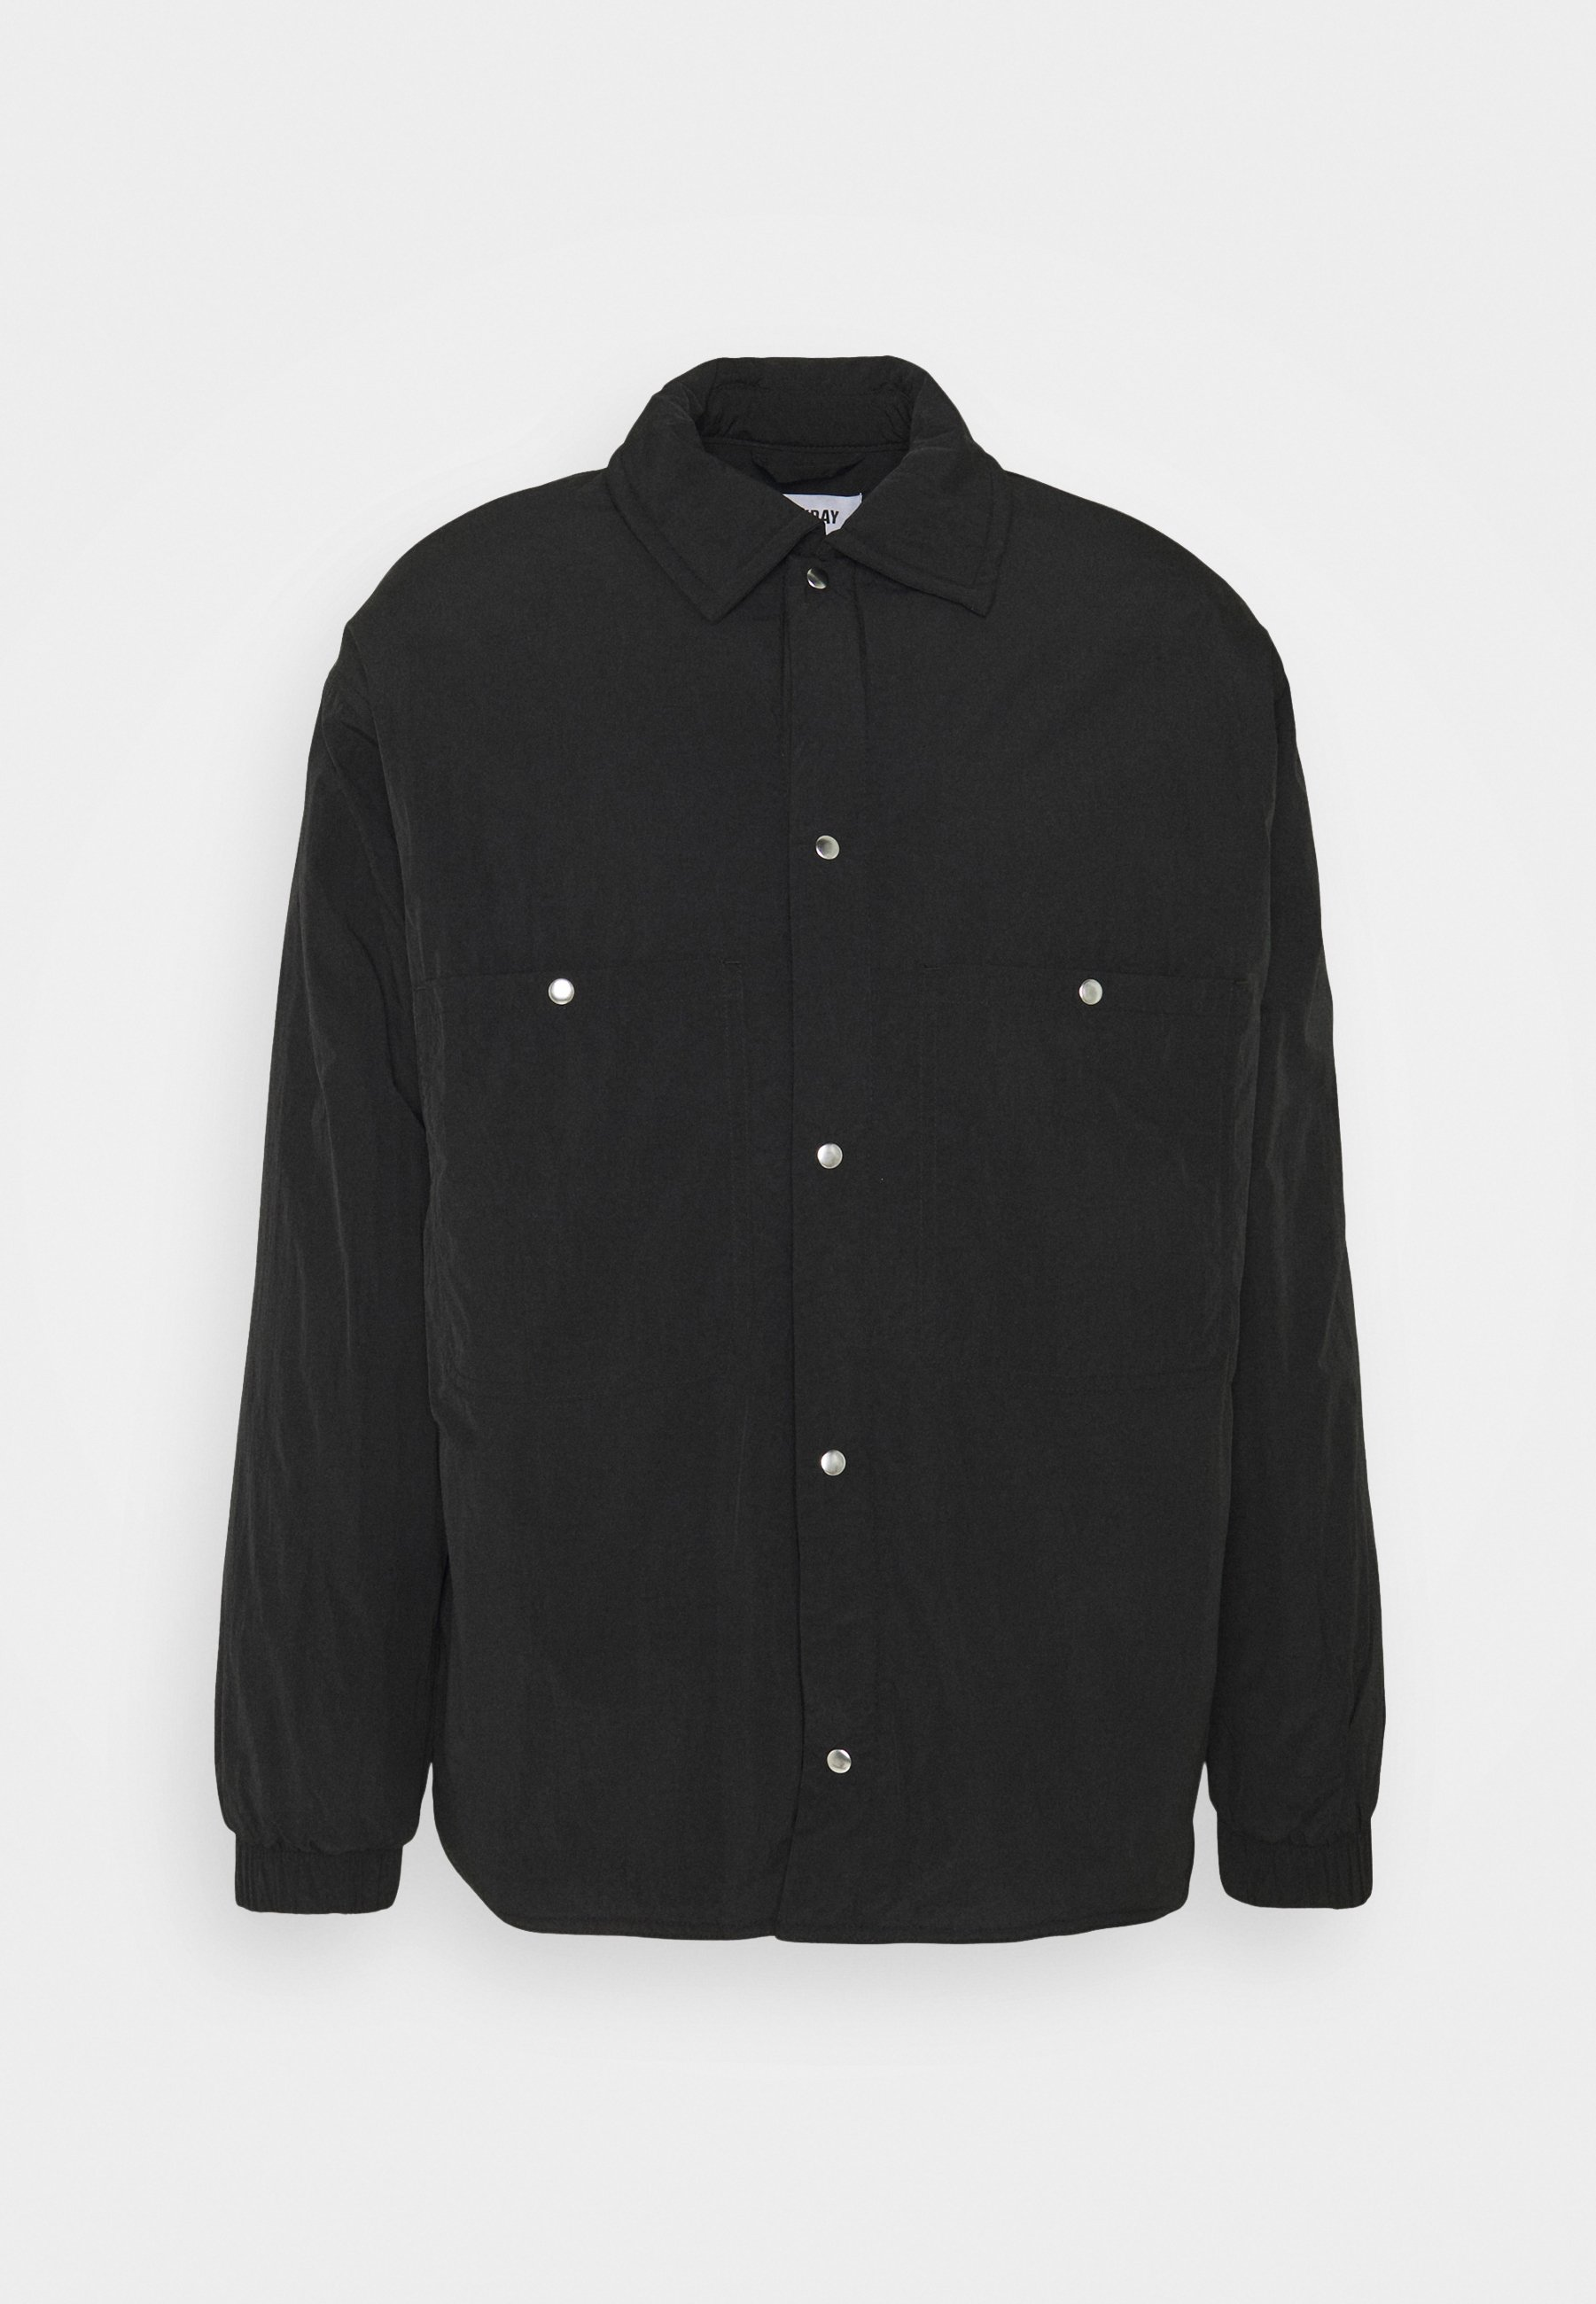 Men AARON JACKET - Light jacket